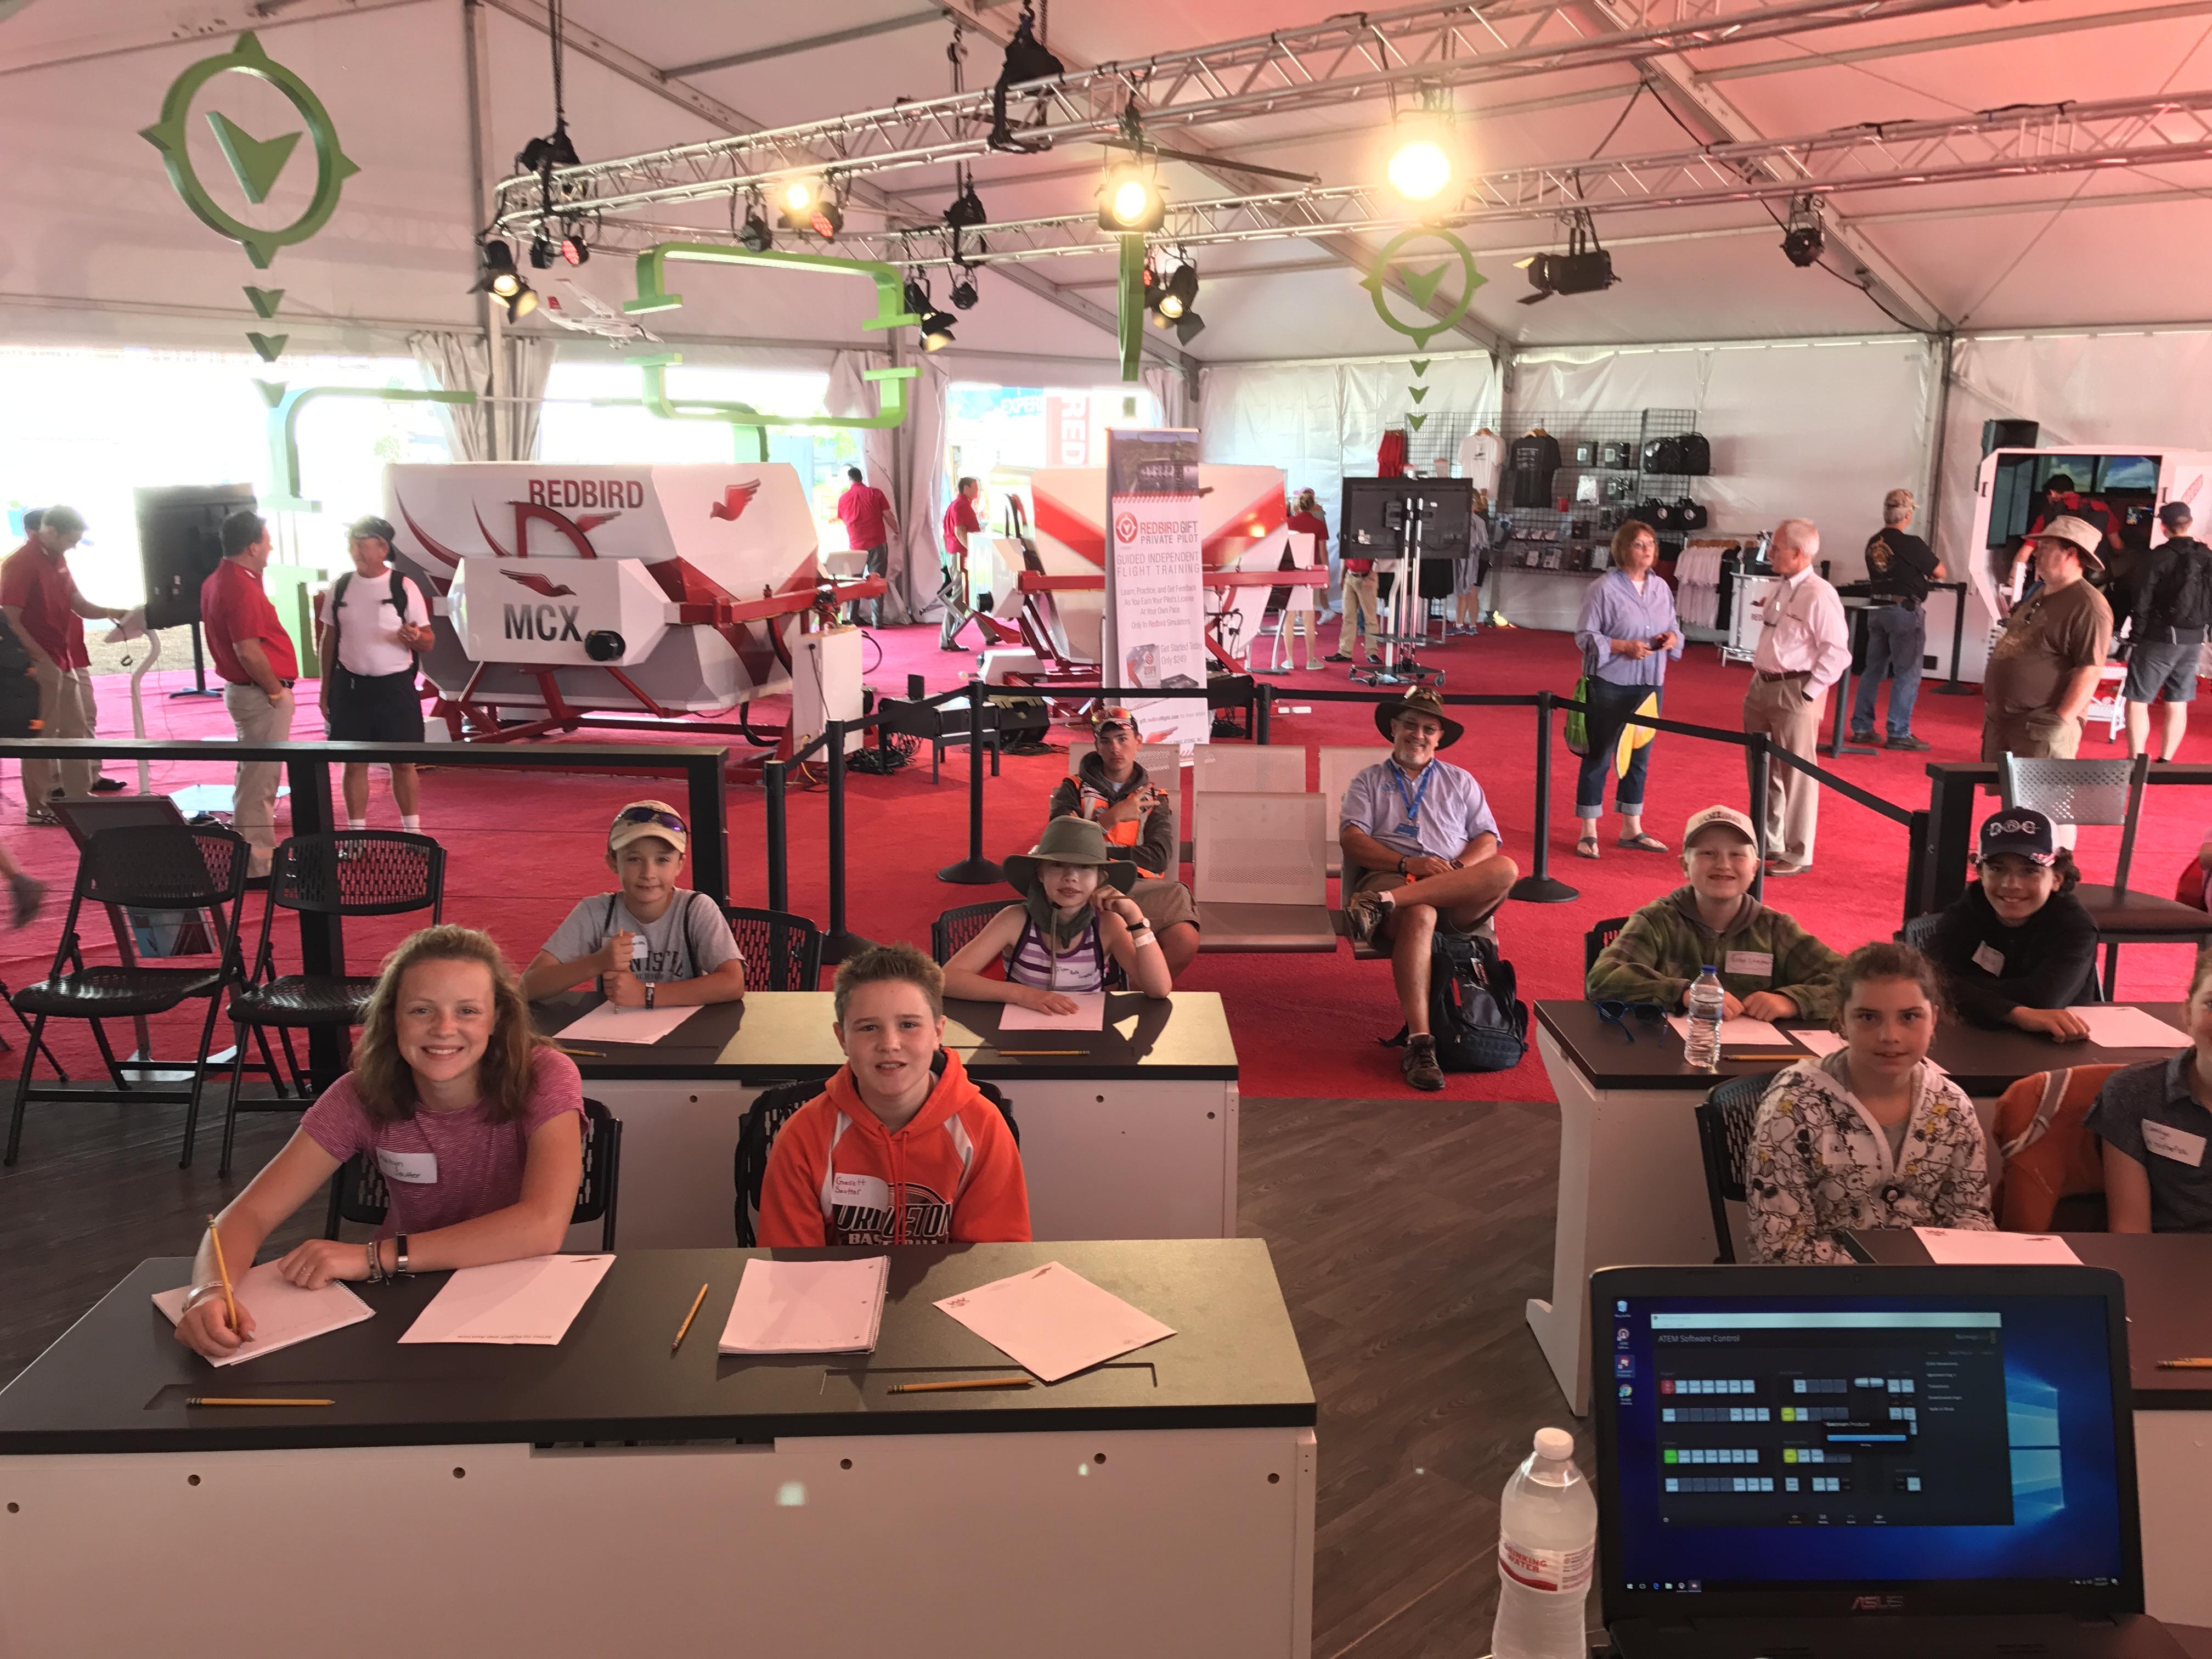 Redbird STEM Lab at AirVenture Oshkosh 2018